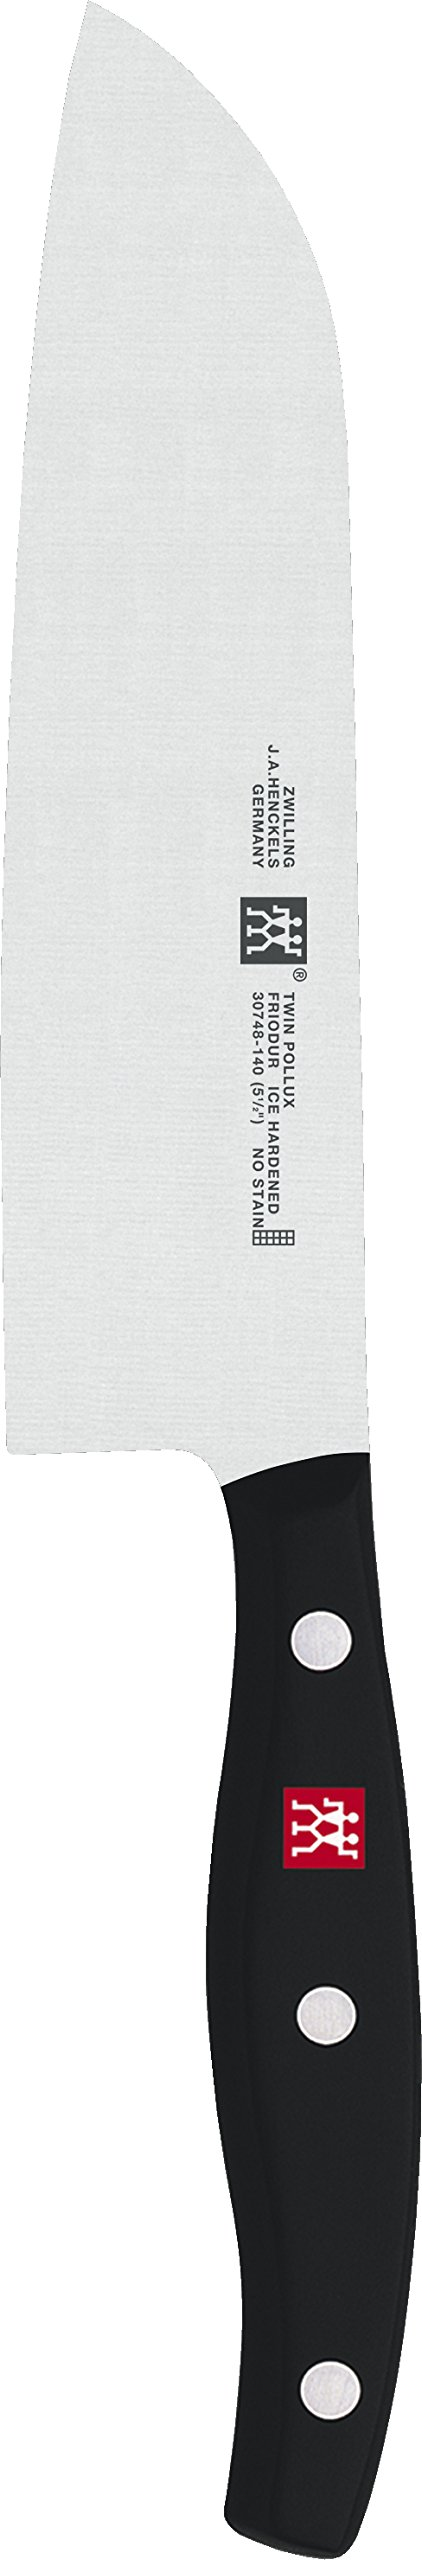 Zwilling Twin Pollux - Cuchillo Santoku, 140 mm product image